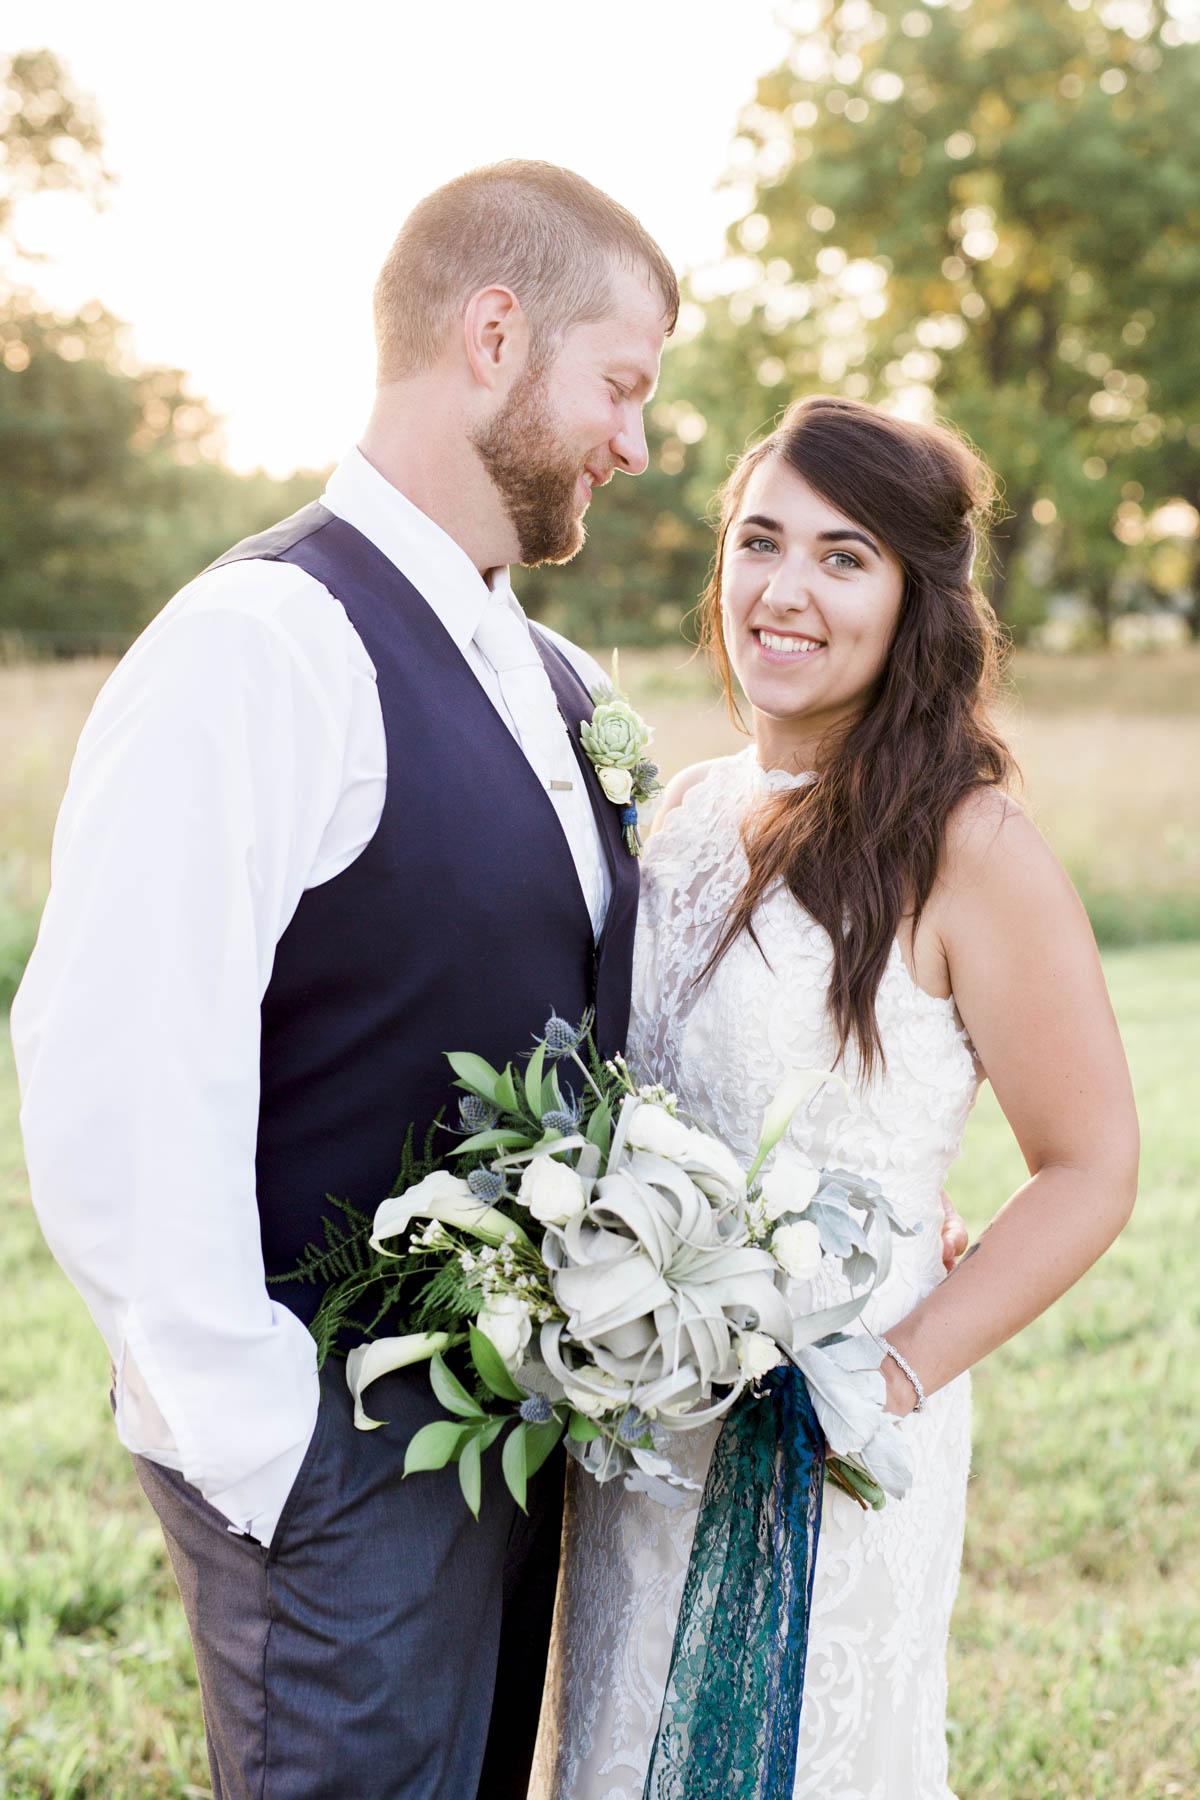 shotbychelsea_wedding_photography_blog-7.jpg